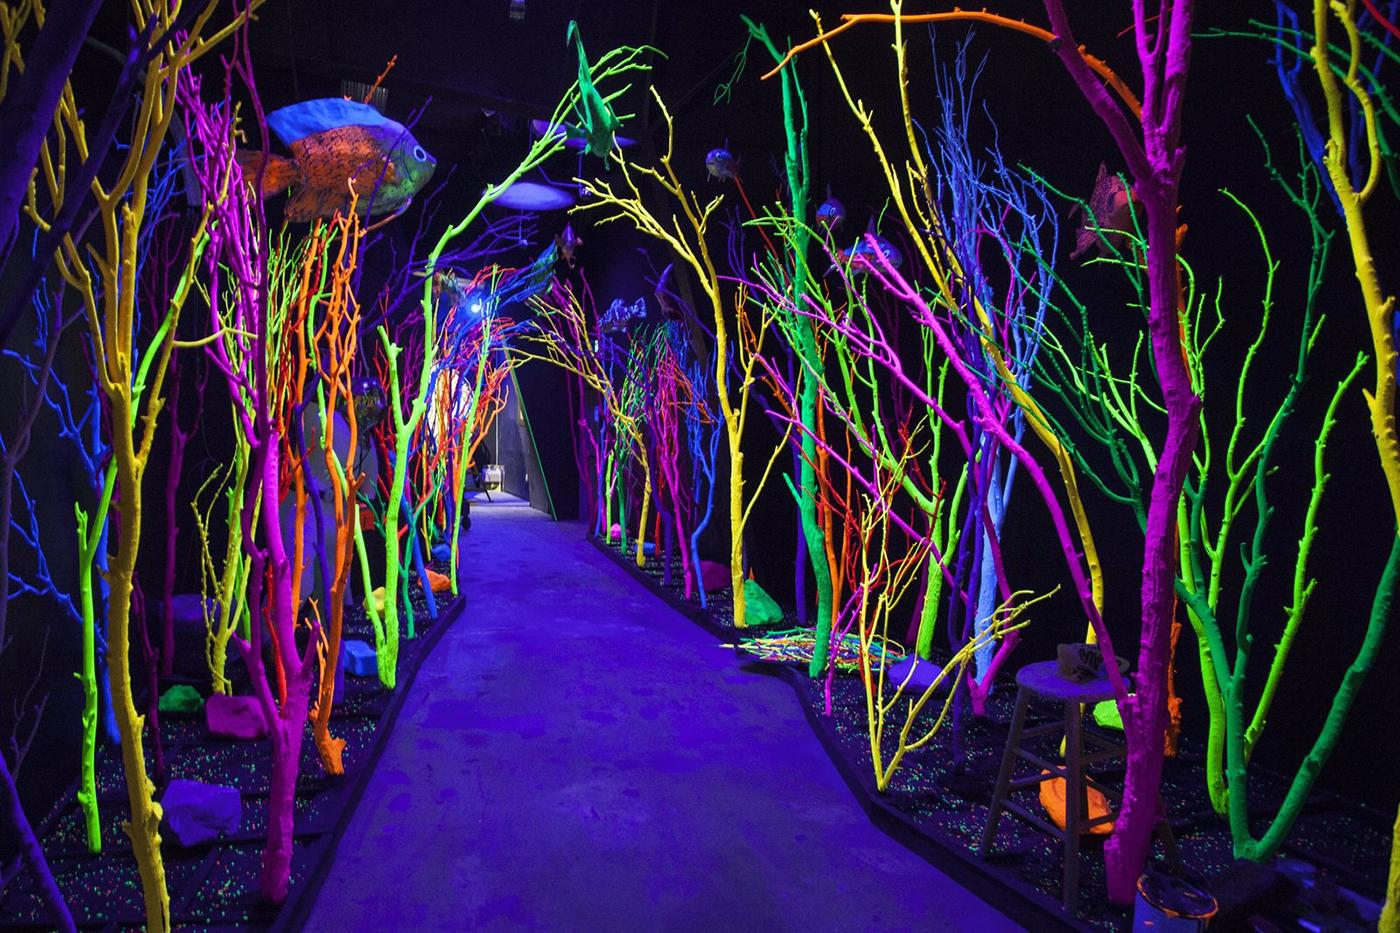 'The Aquarium', an installation by Matt King at 'House of Eternal Return'.